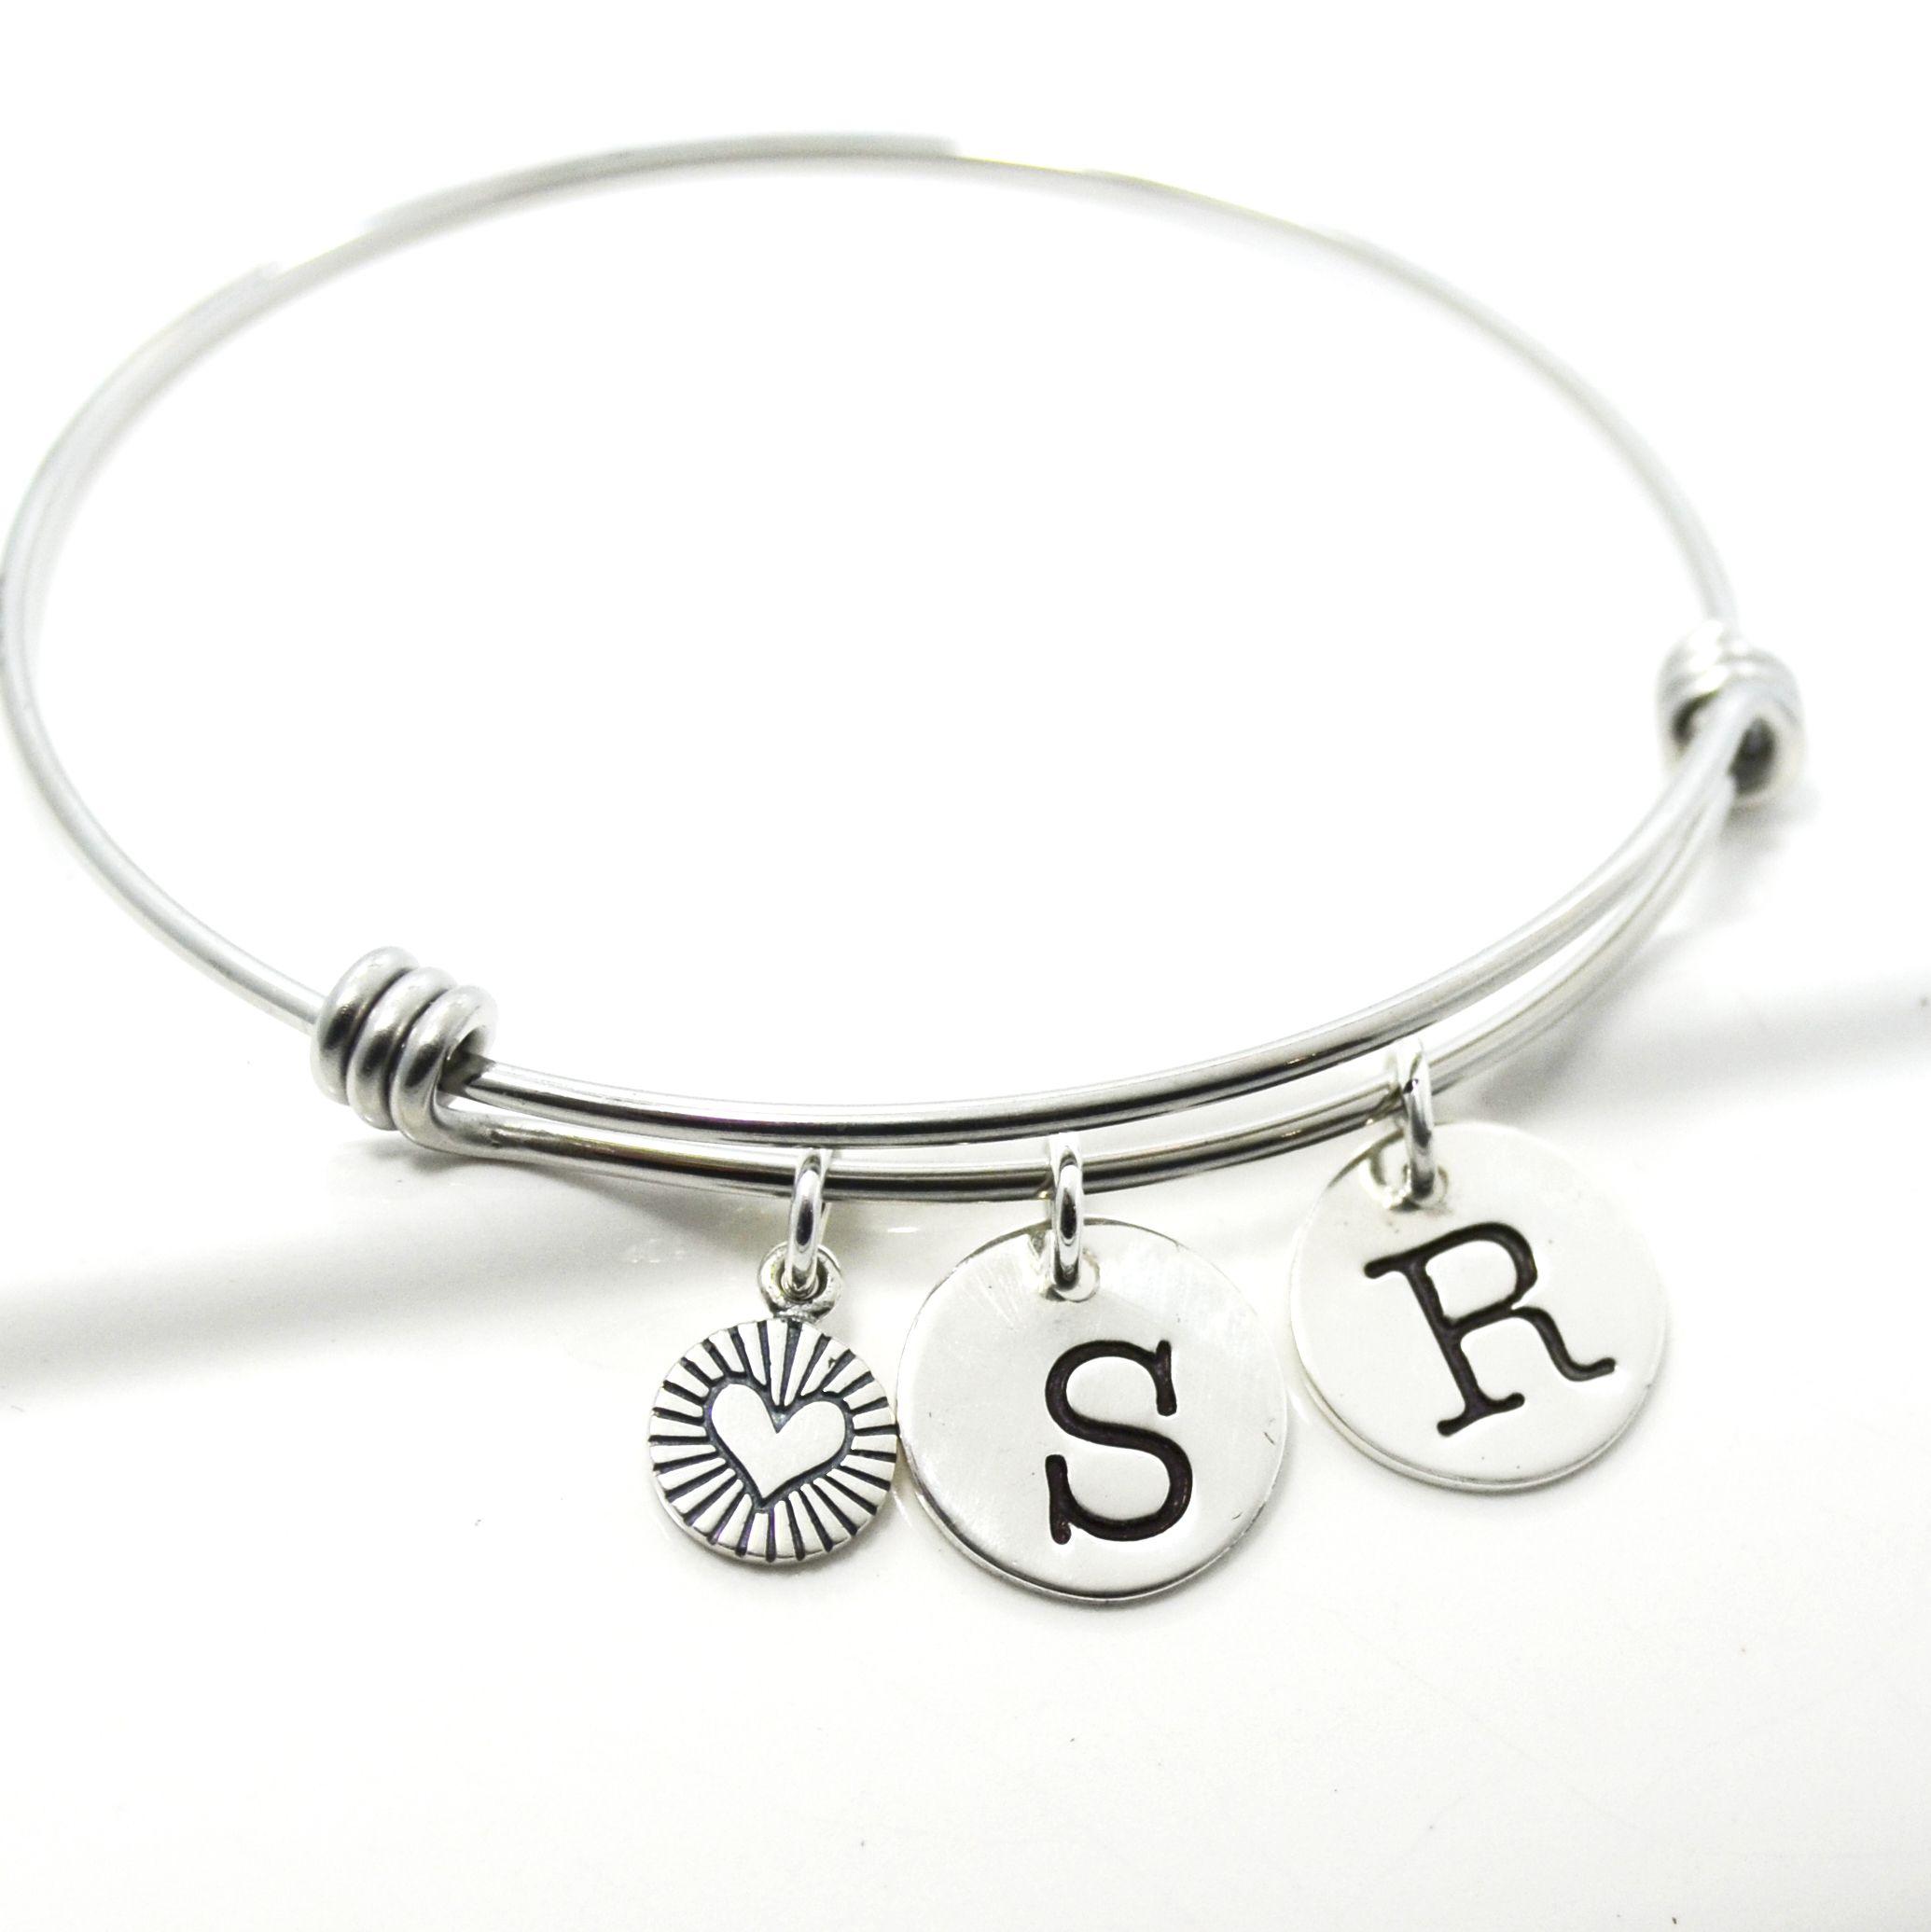 Custom Made Initial Bangle Charm Bracelet S Mothers